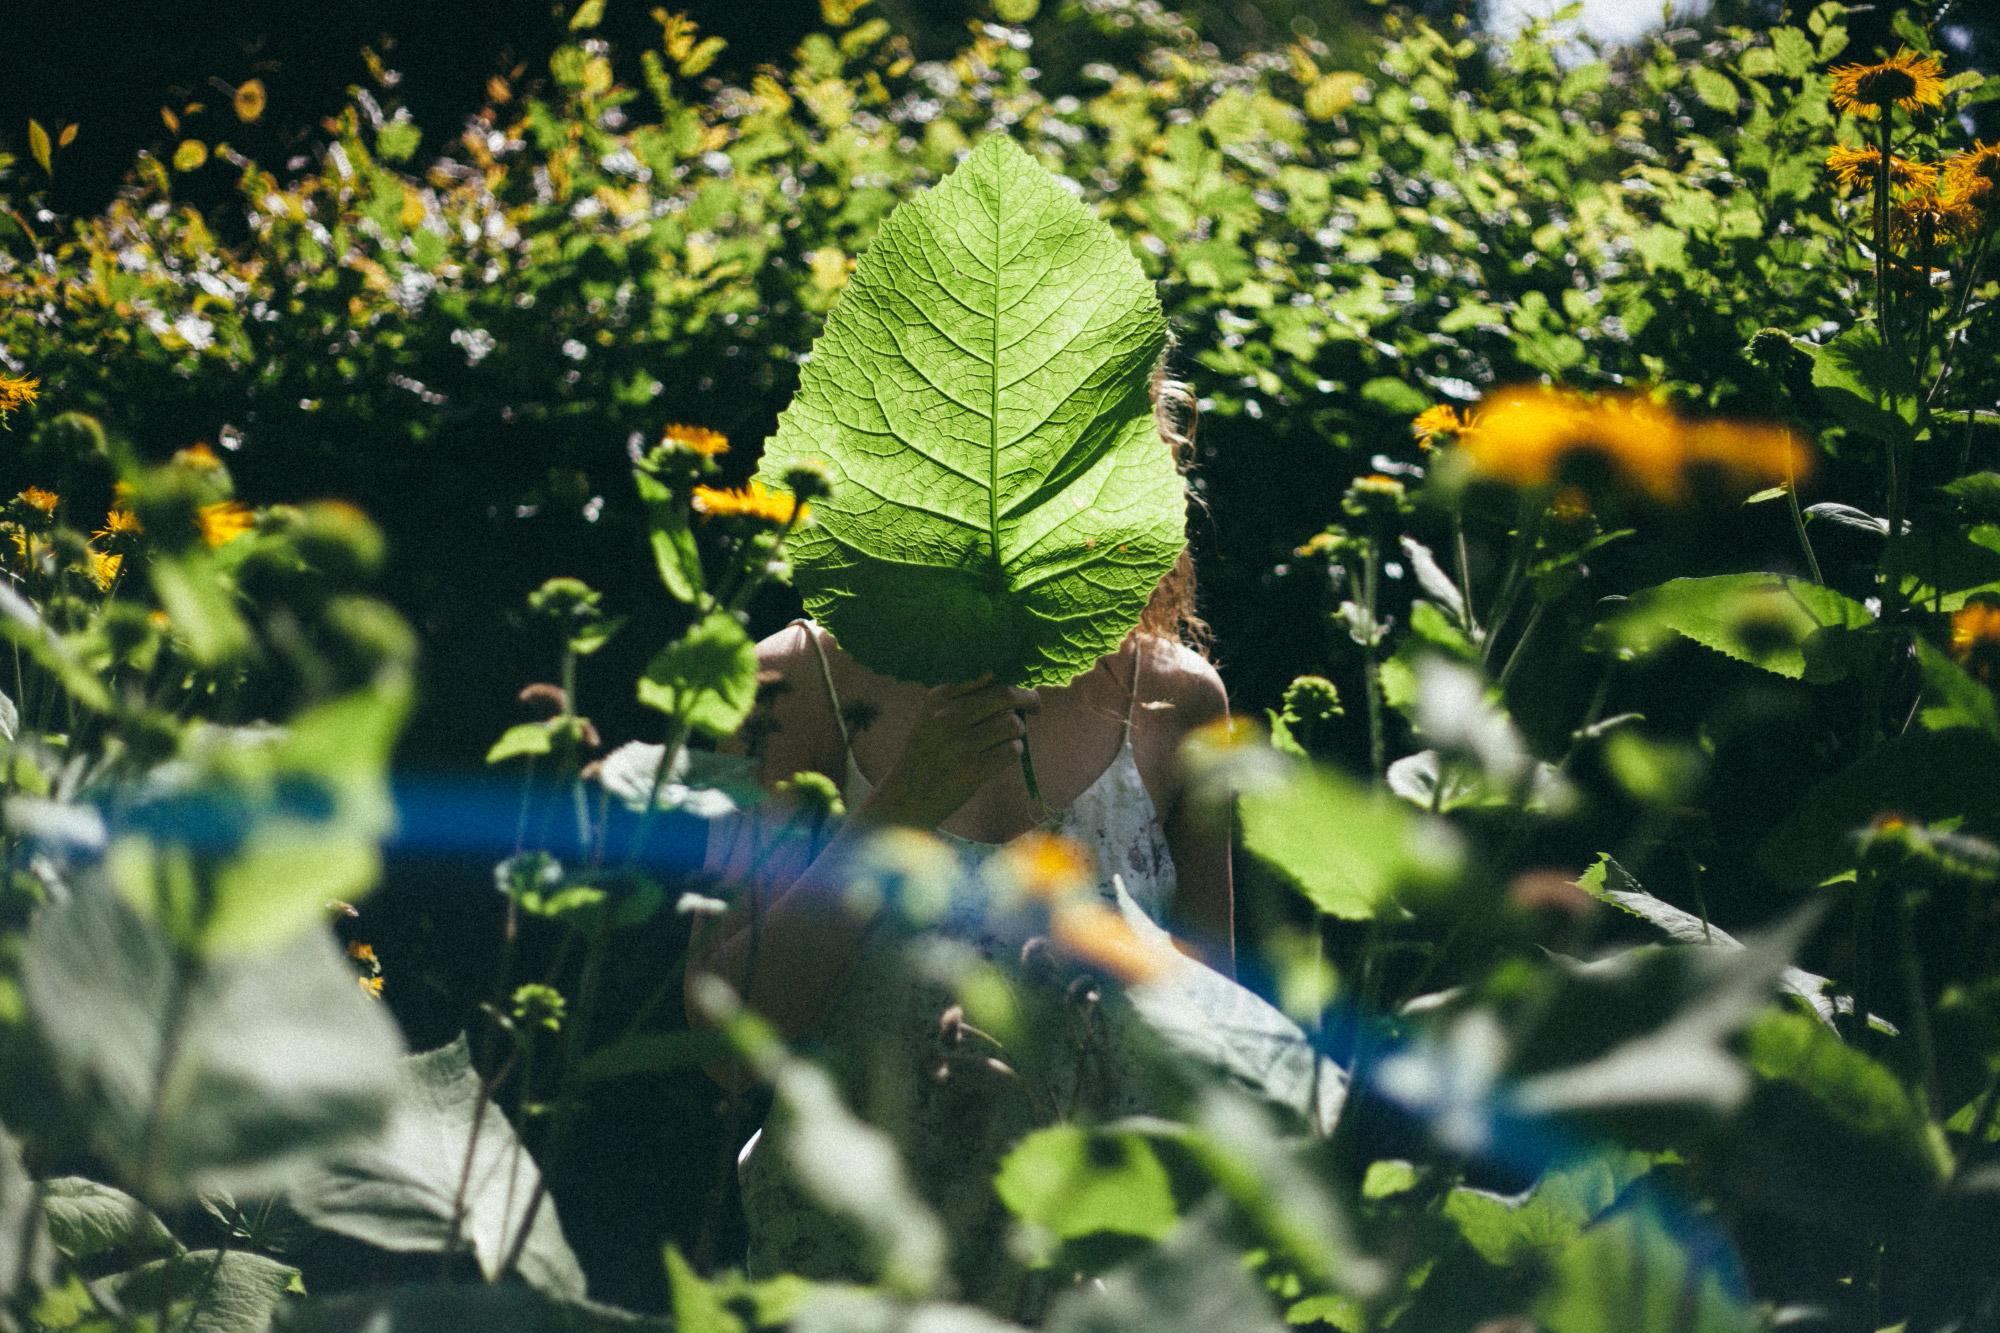 koebenhavns-plantefarveri-flowerscape-collection-string-top_web.jpg